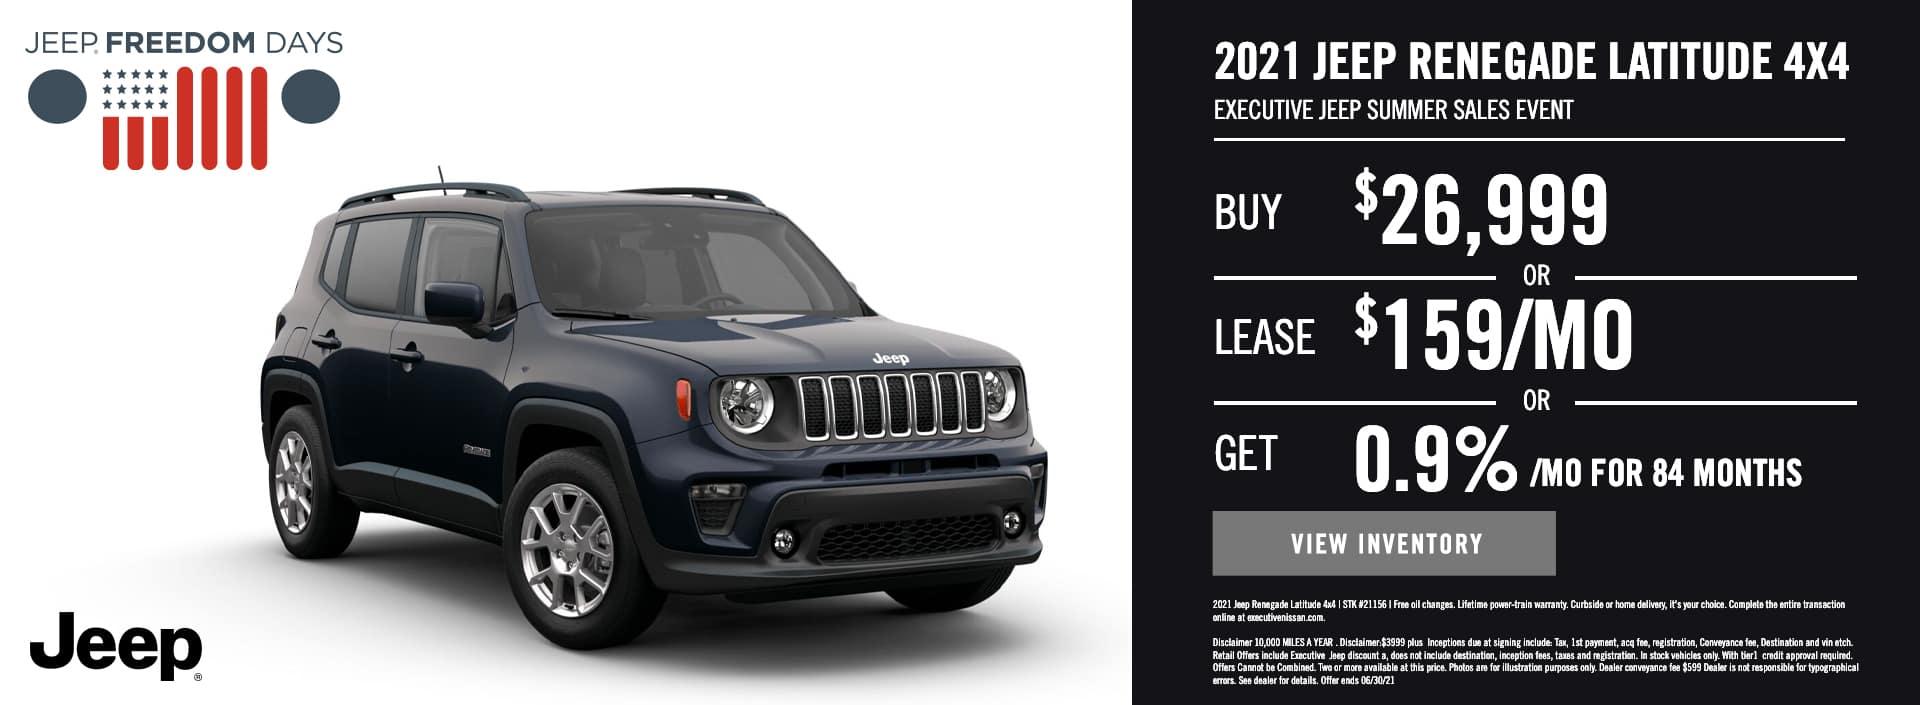 EAG_Jeep_2021 Jeep Renegade Latitude 4×4